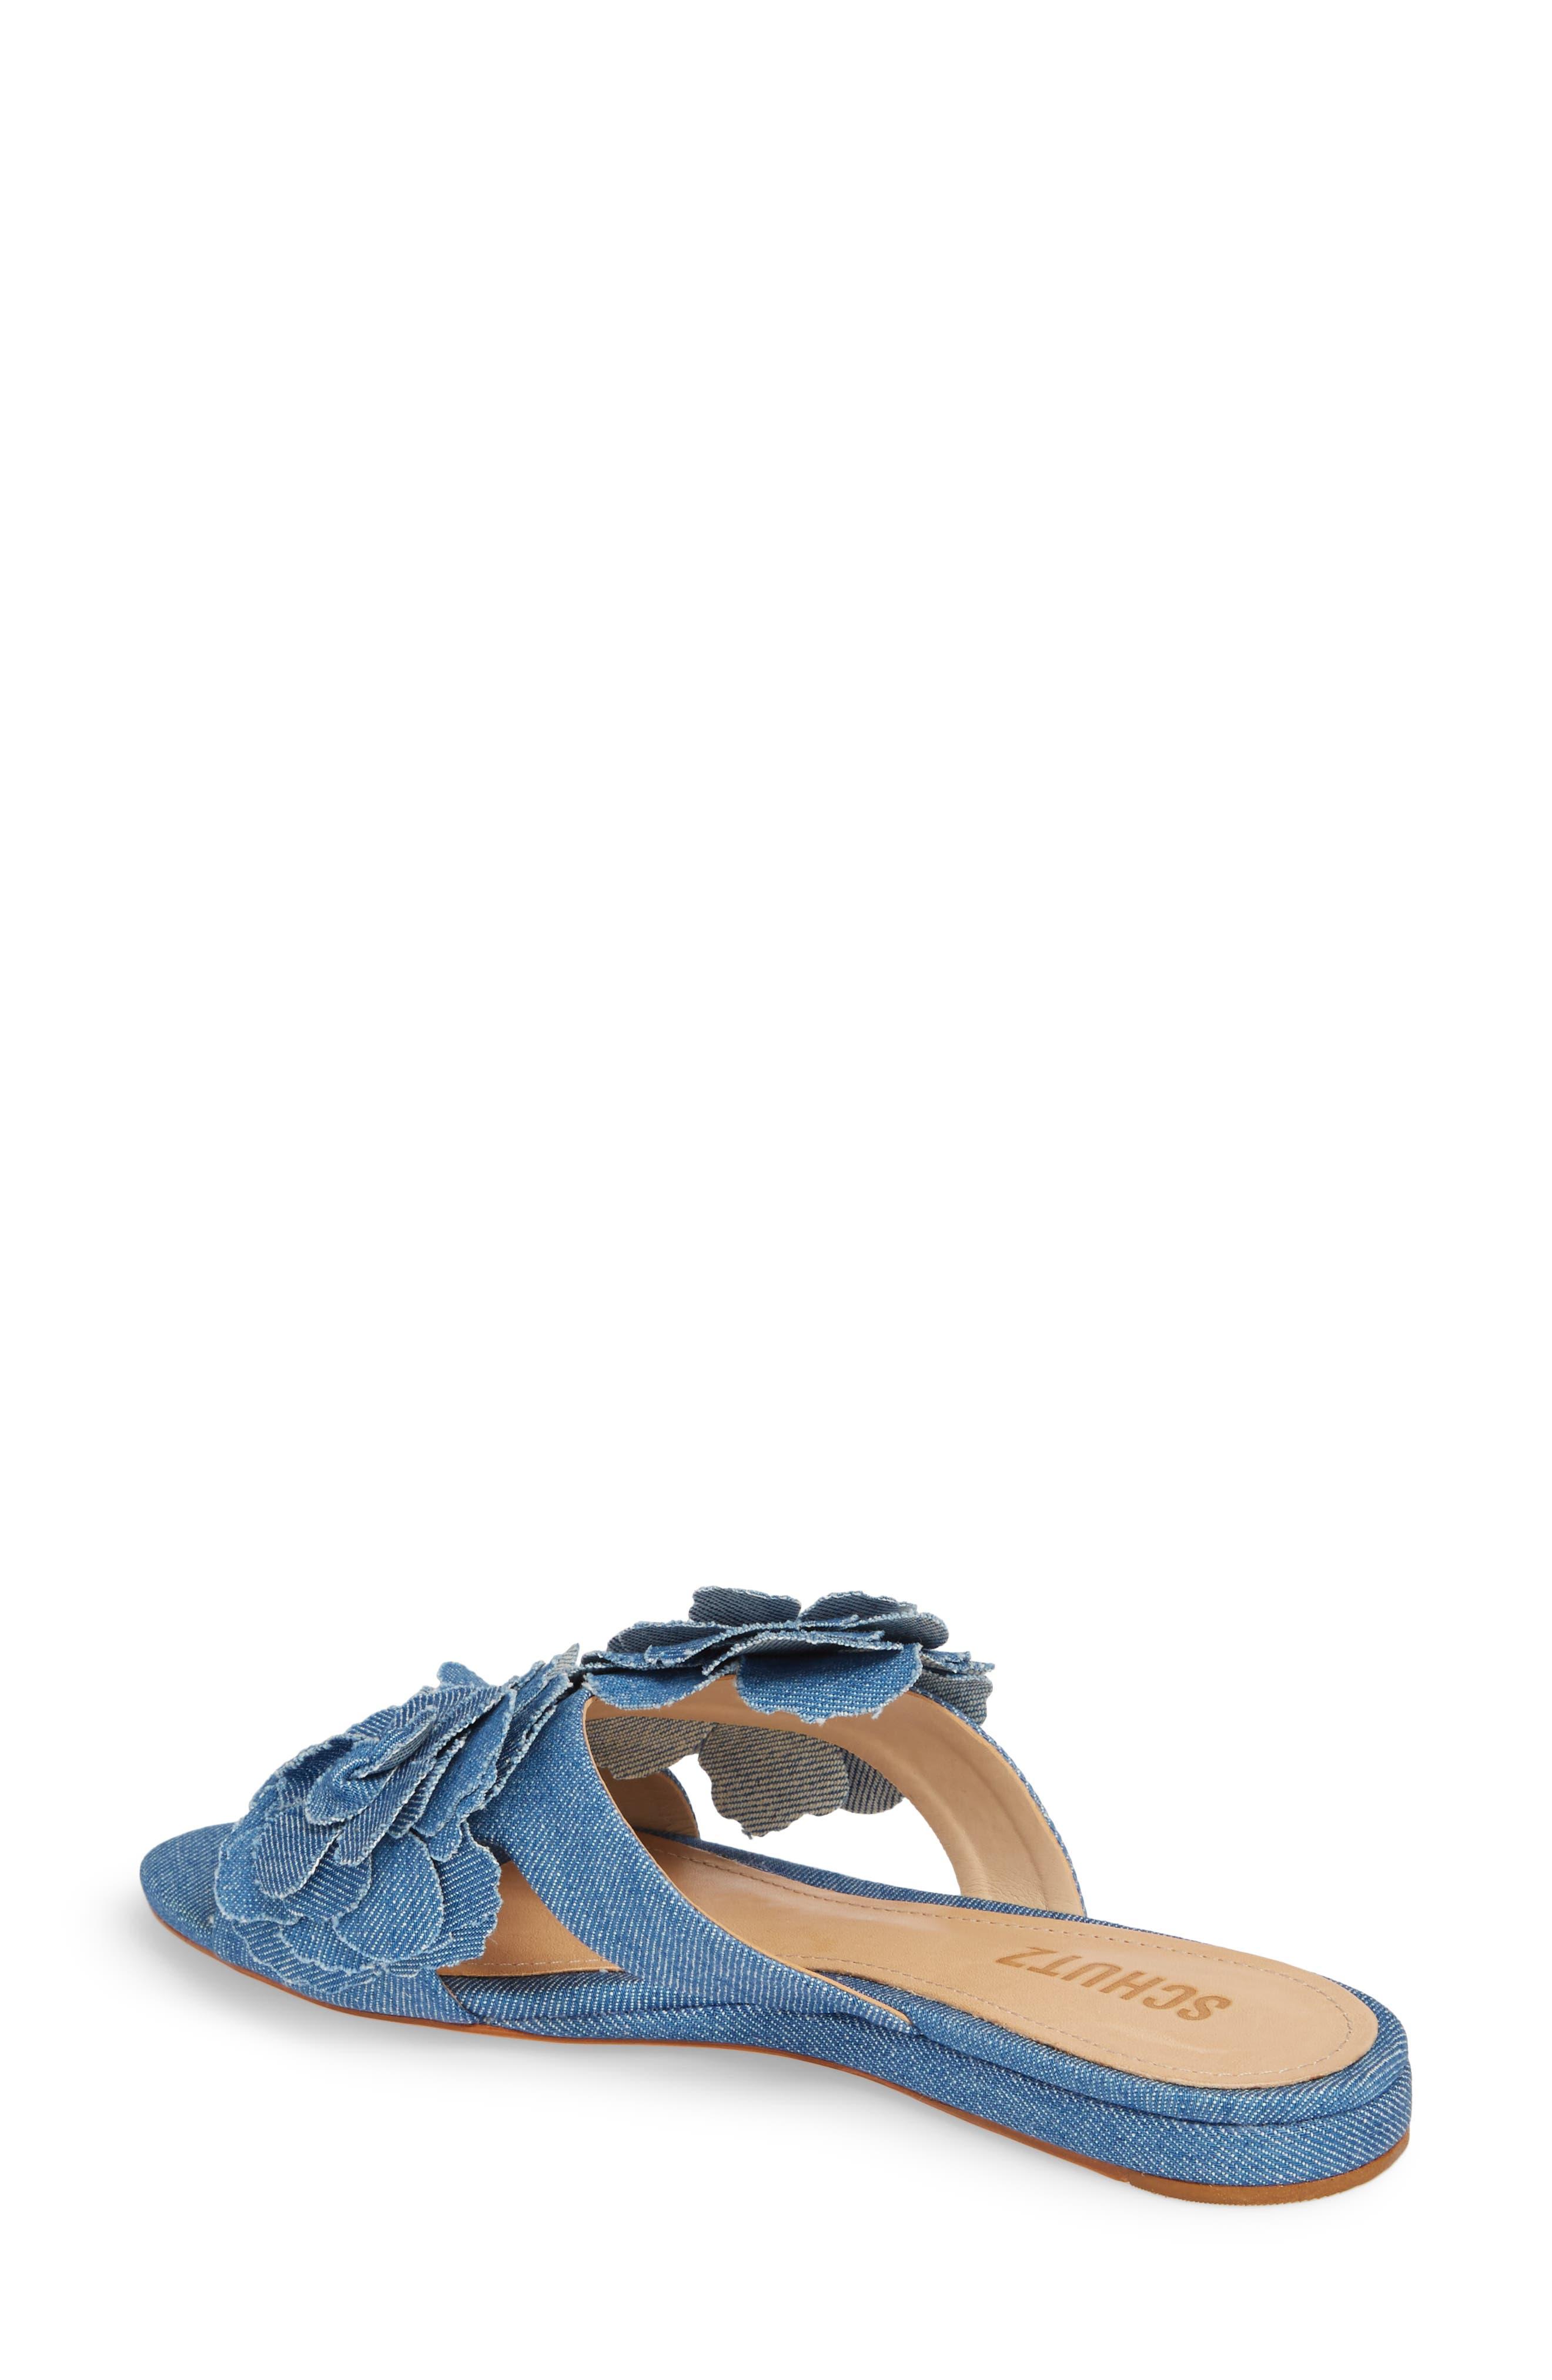 Ilaria Flower Sandal,                             Alternate thumbnail 2, color,                             LIGHT BLUE